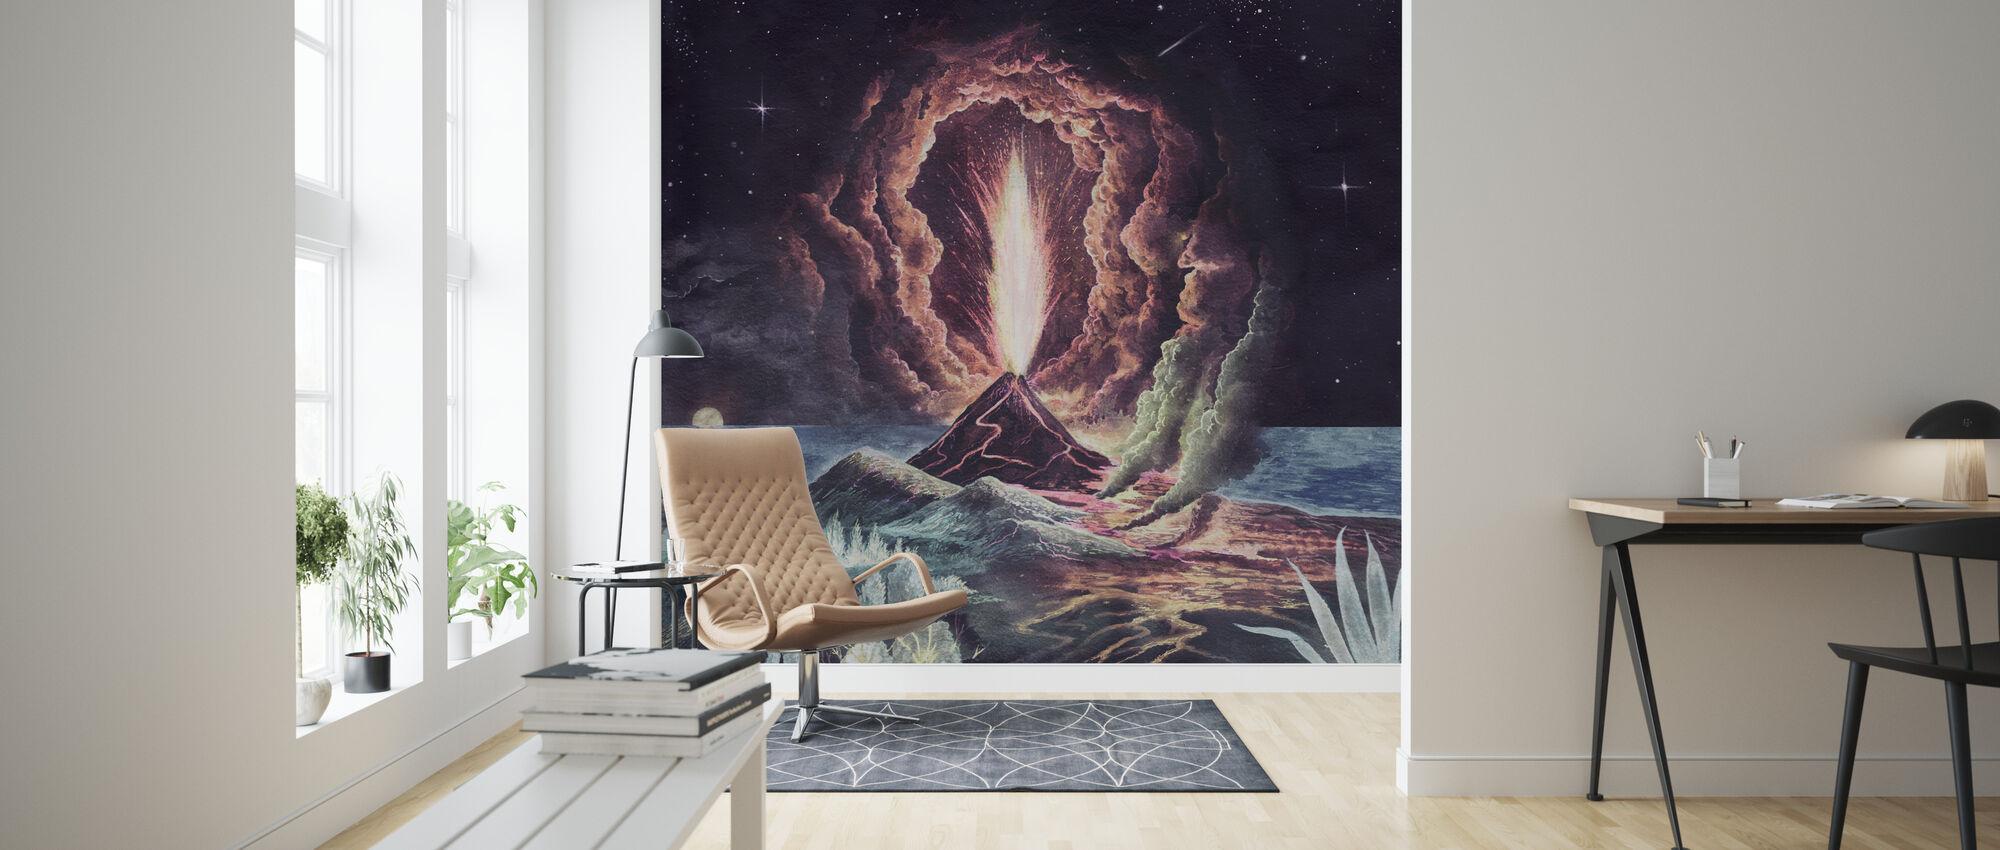 Volcano Eruption - Wallpaper - Living Room